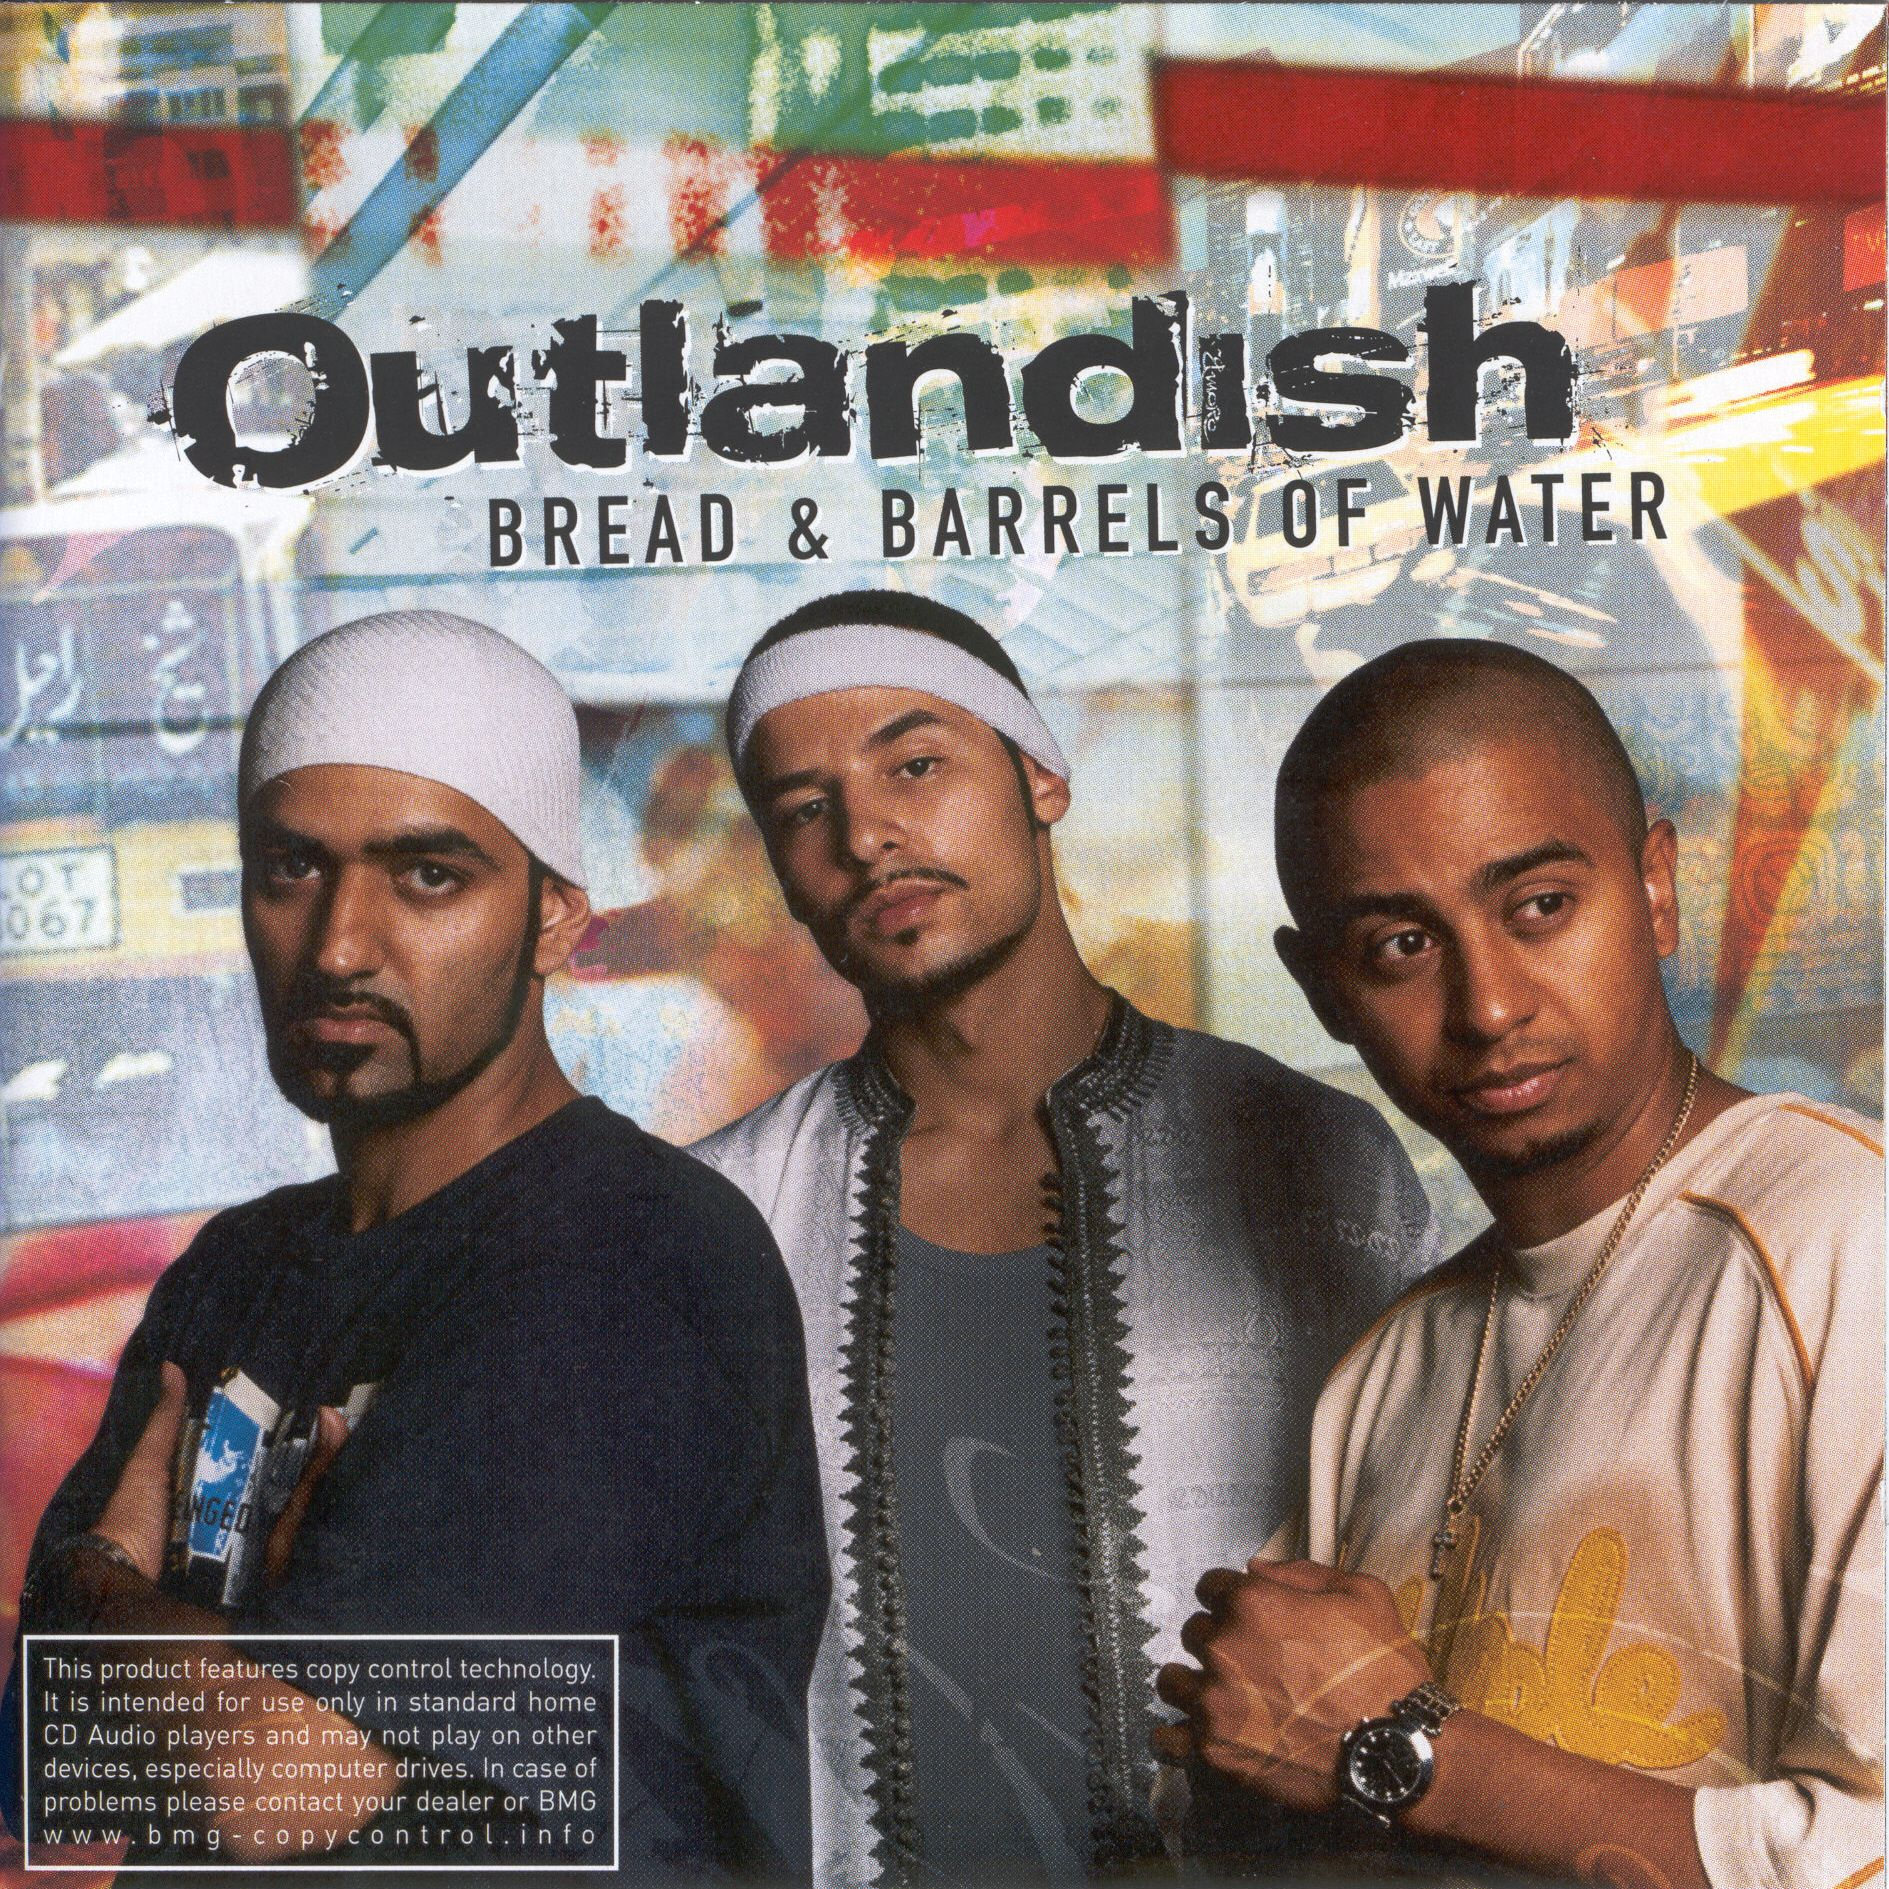 Outlandish - Bread & Barrels Of Water album cover